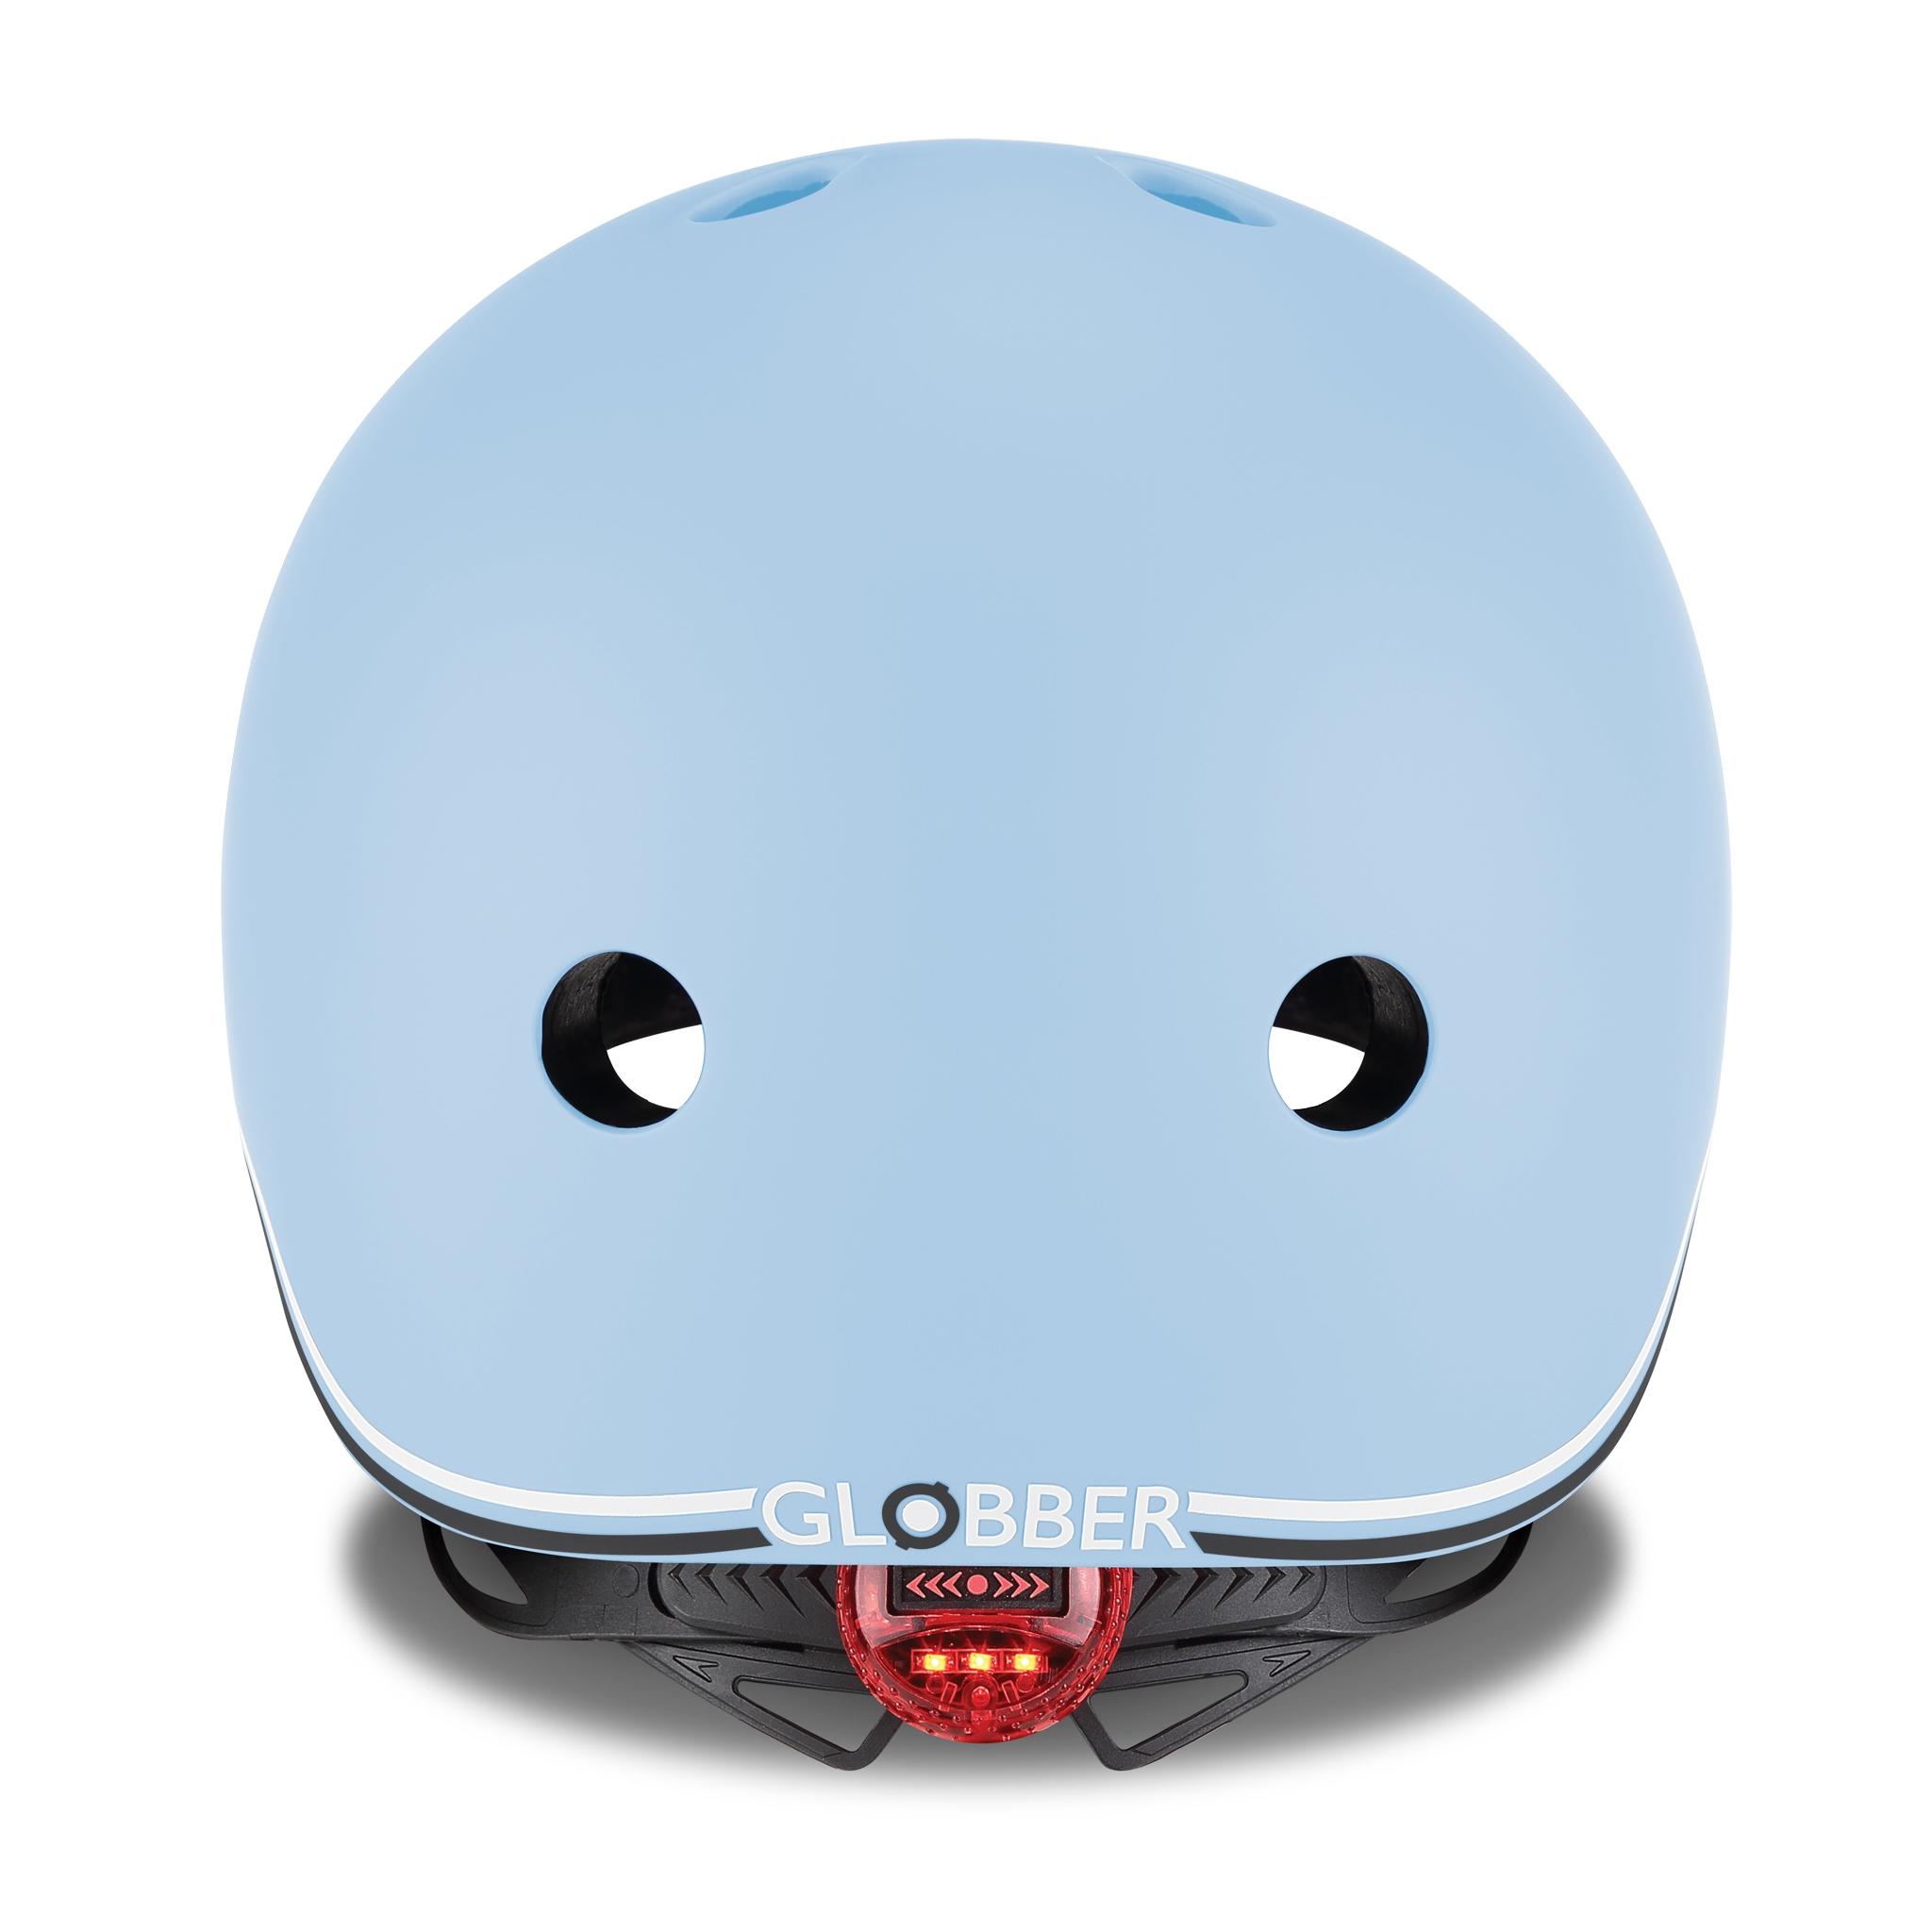 GO-UP-helmets-scooter-helmets-for-toddlers-with-LED-lights-safe-helmet-for-toddlers-pastel-blue 2